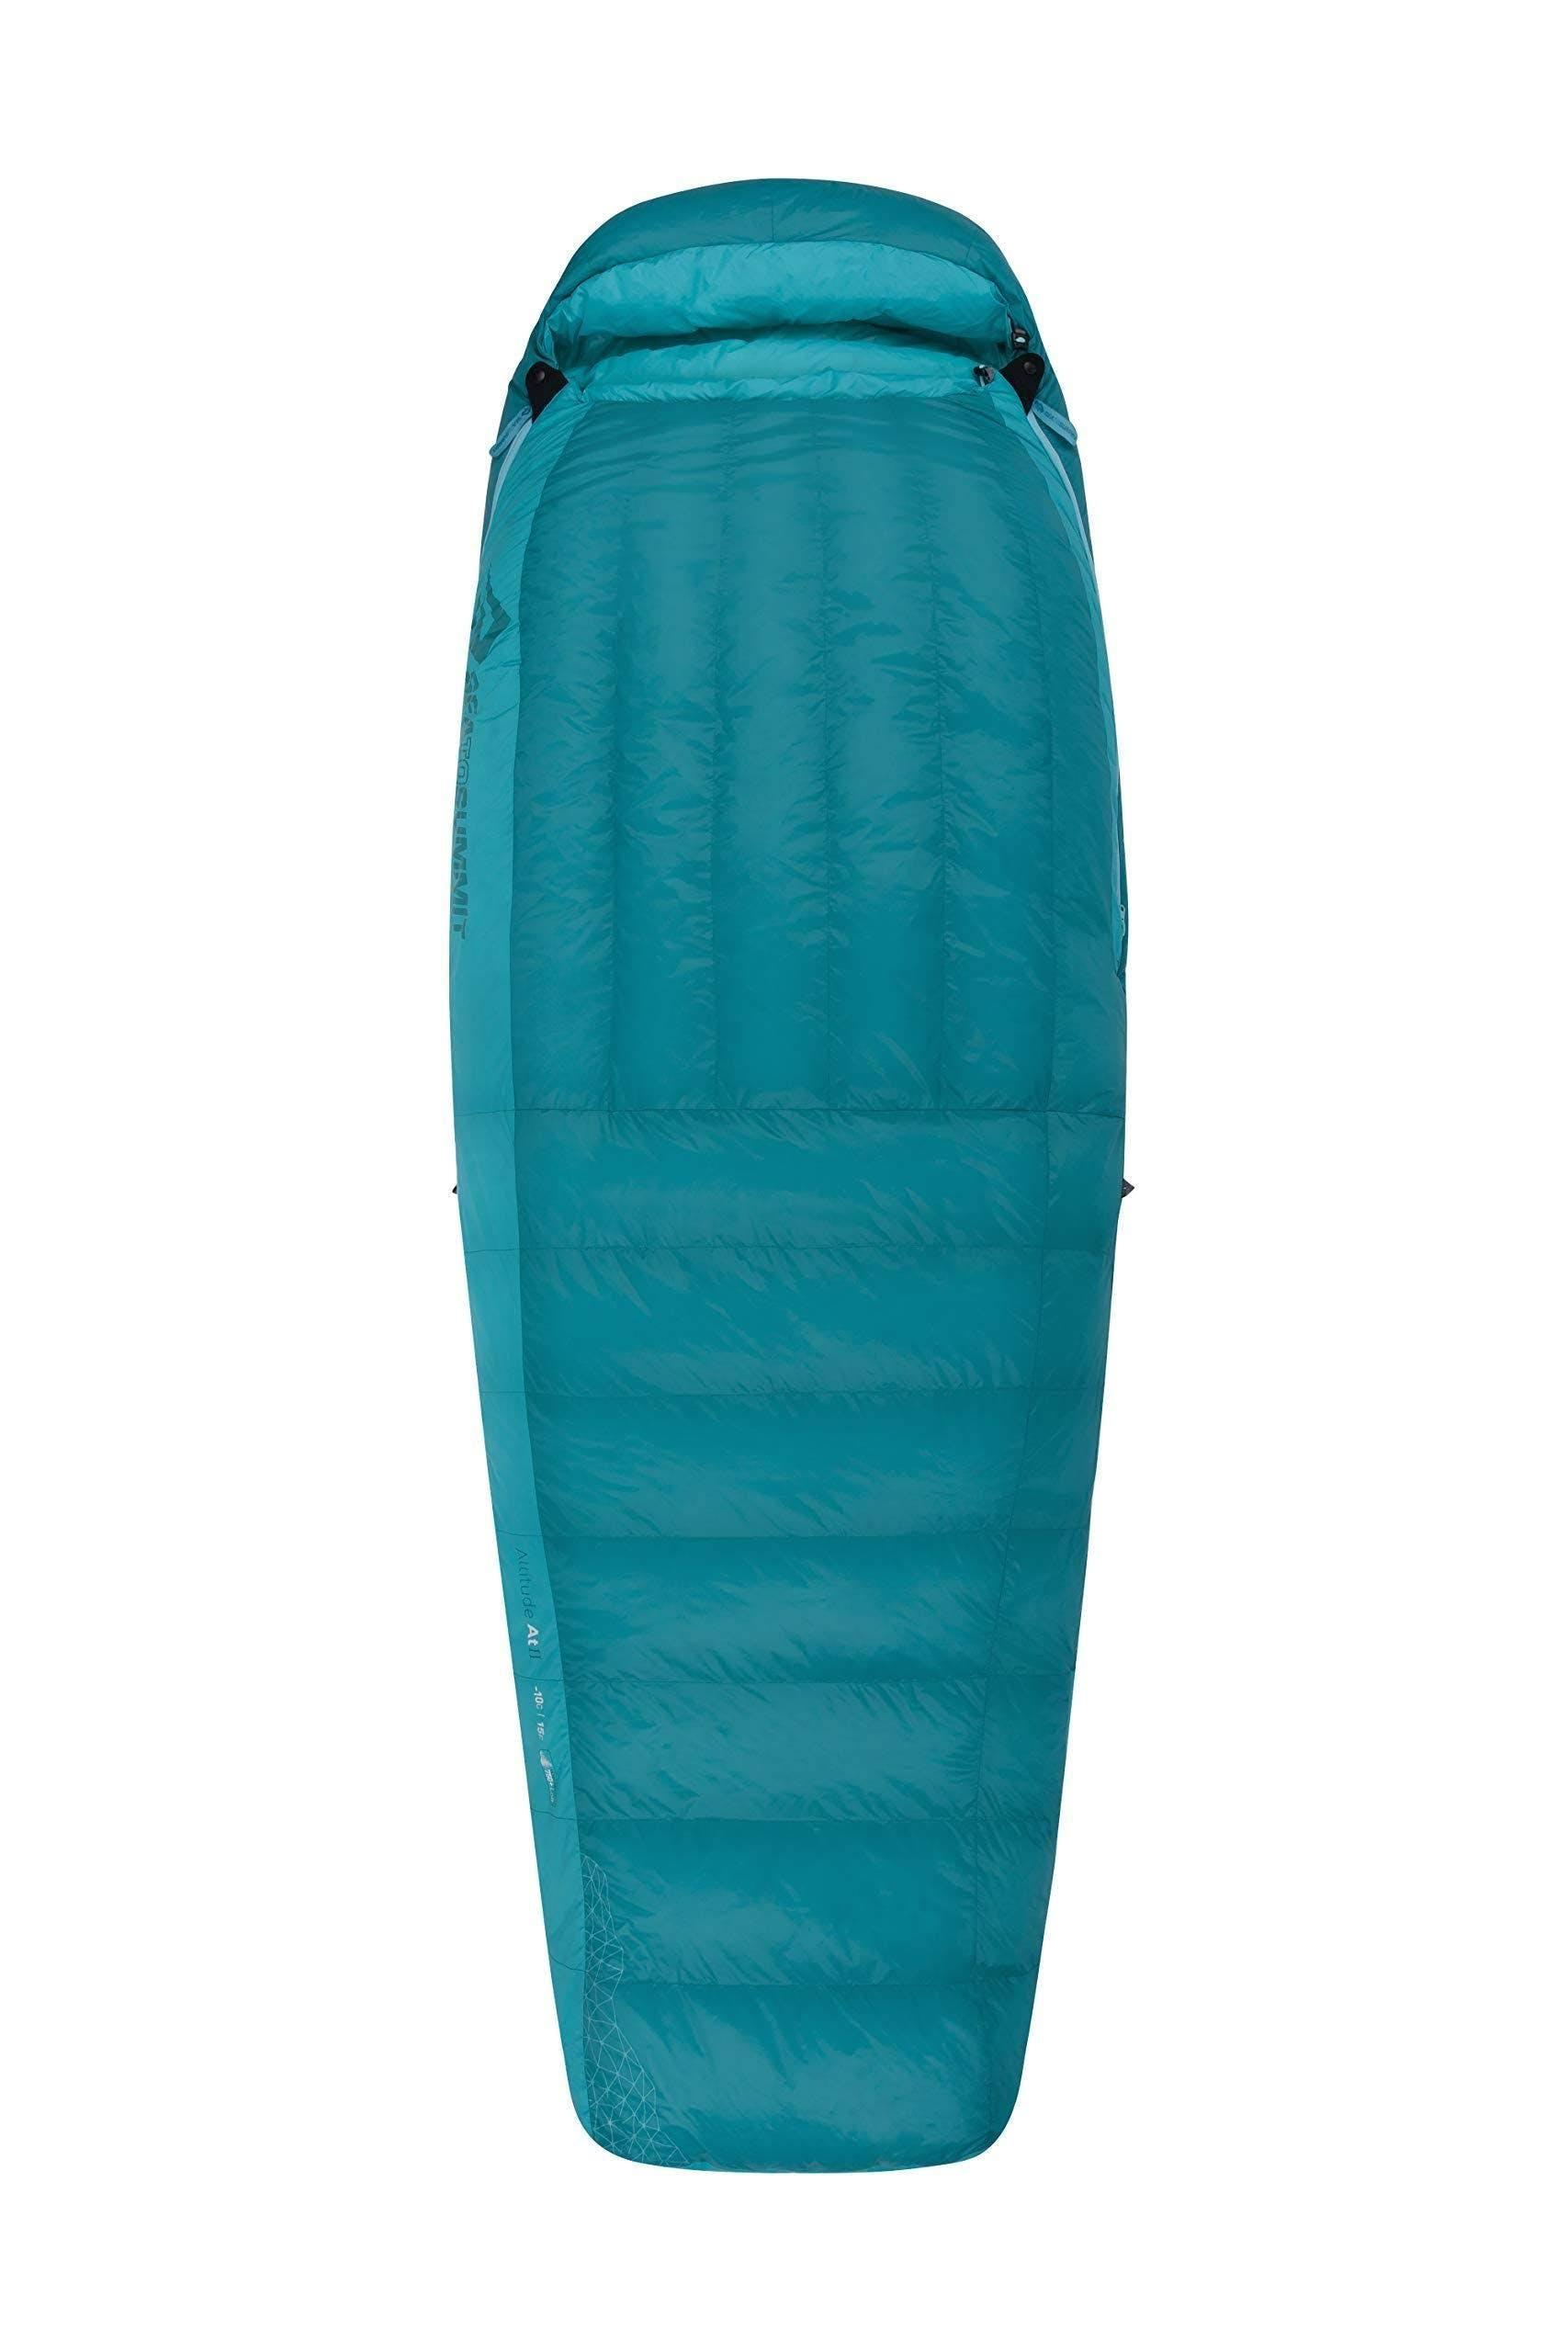 Sea to Summit Altitude atii -10C Women's Sleeping Bag (Regular)